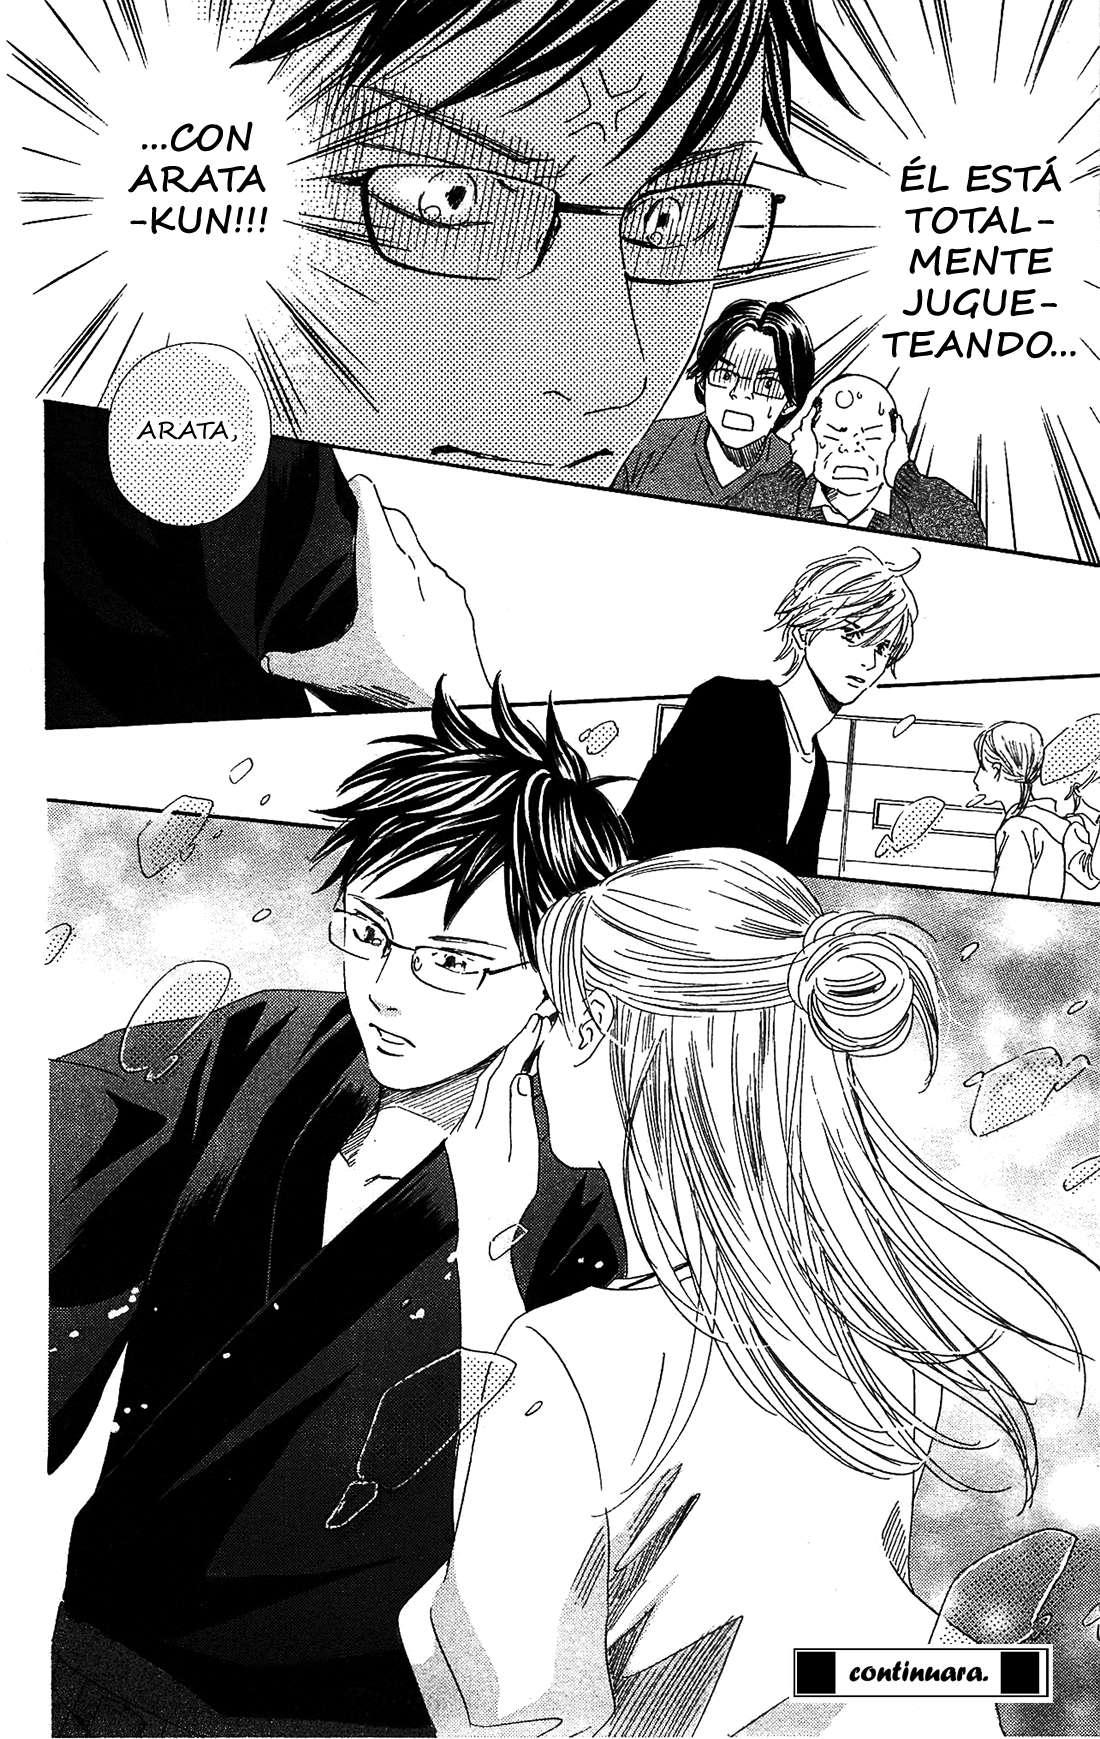 http://c5.ninemanga.com/es_manga/32/1824/398206/850a40f2ba21fec8567a3769263d1c5c.jpg Page 31